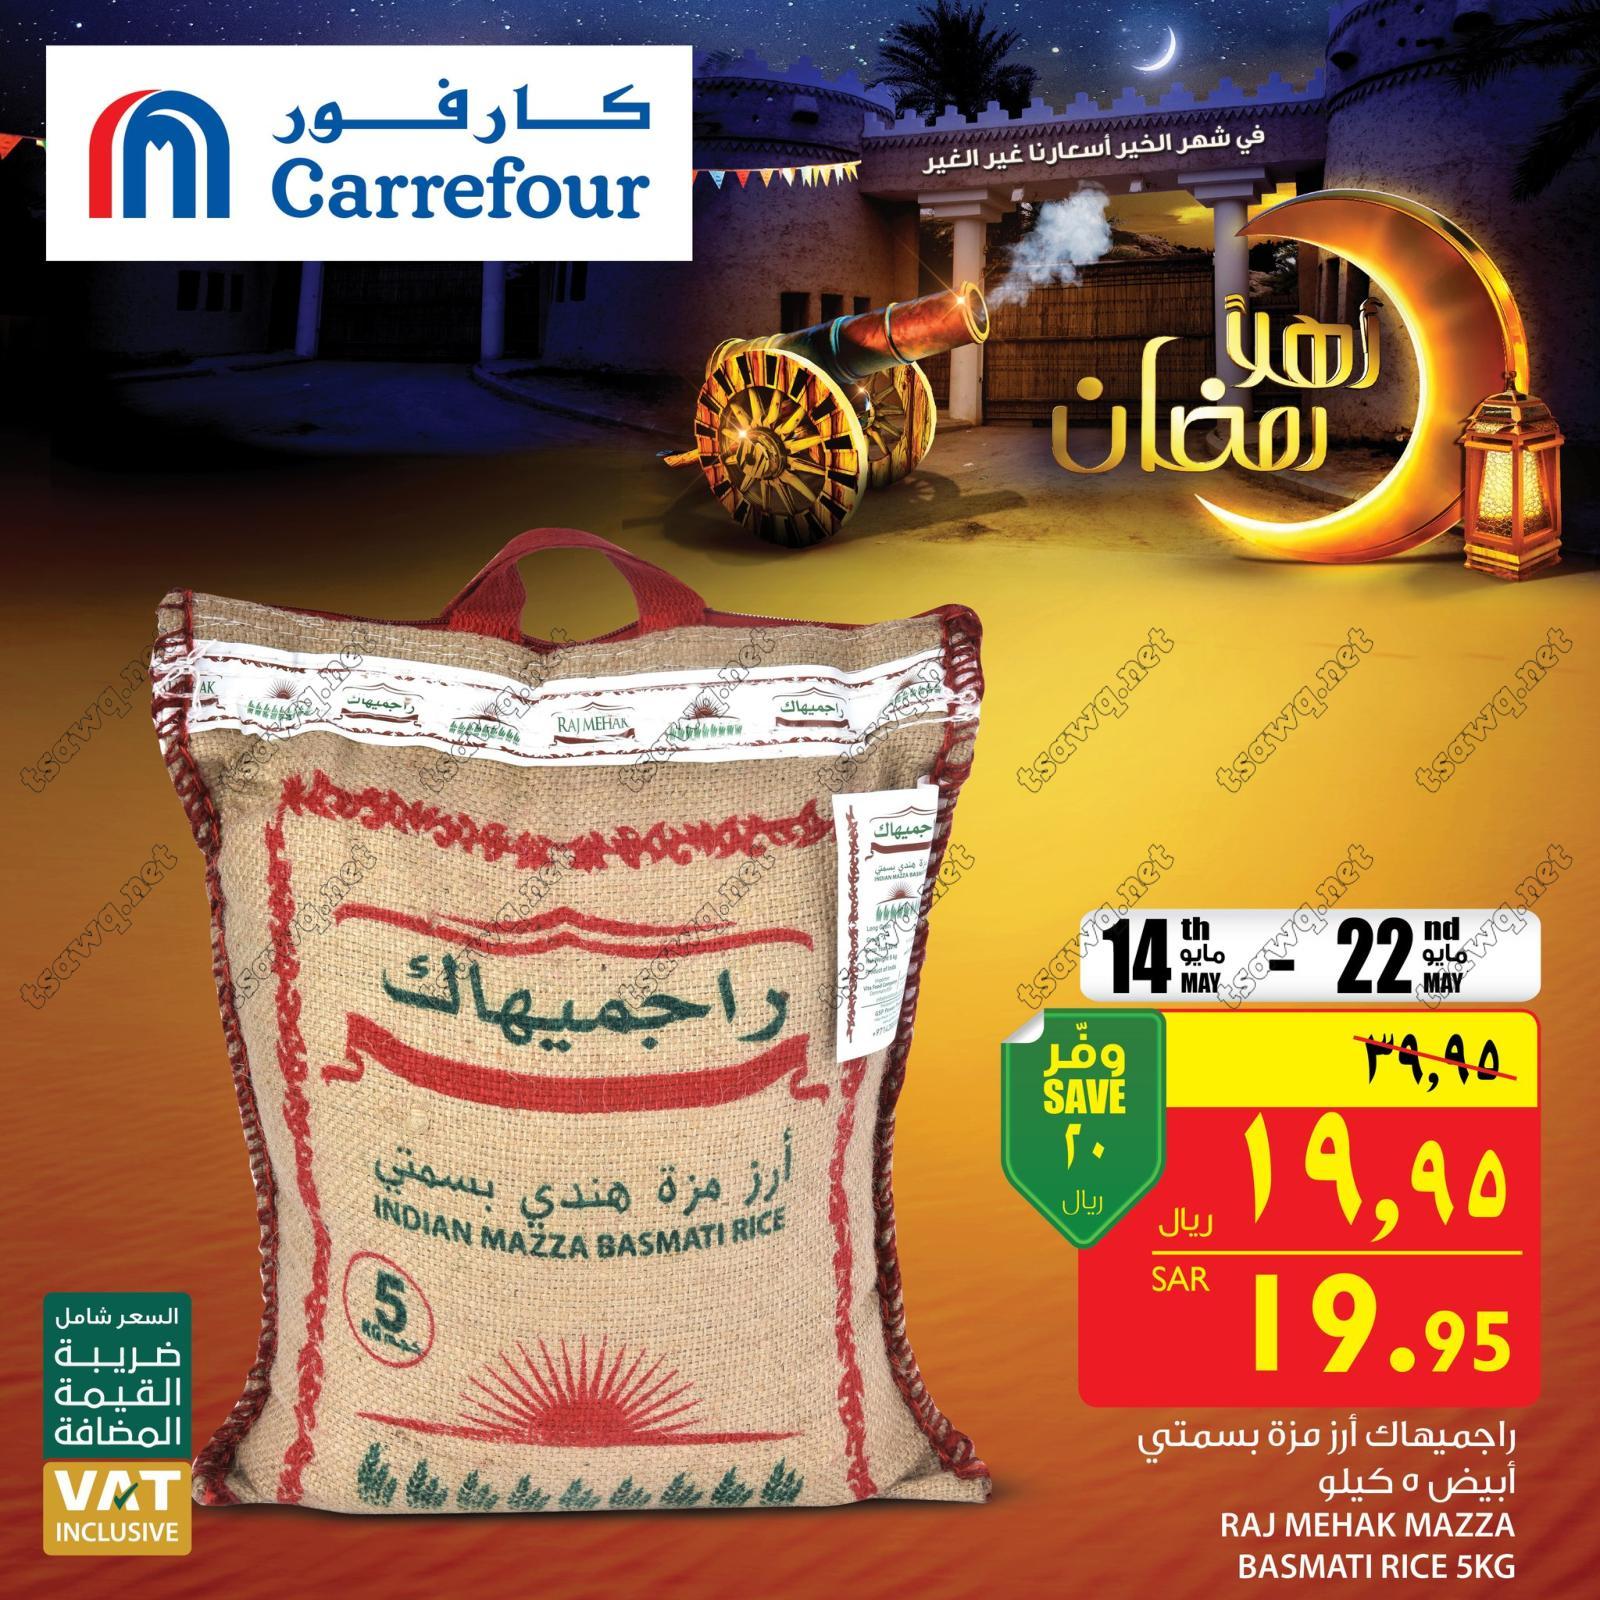 f23bf4909 مختصر عروض كارفور السعودية من 14 حتى 22-5-2018 رمضان | تسوق نت